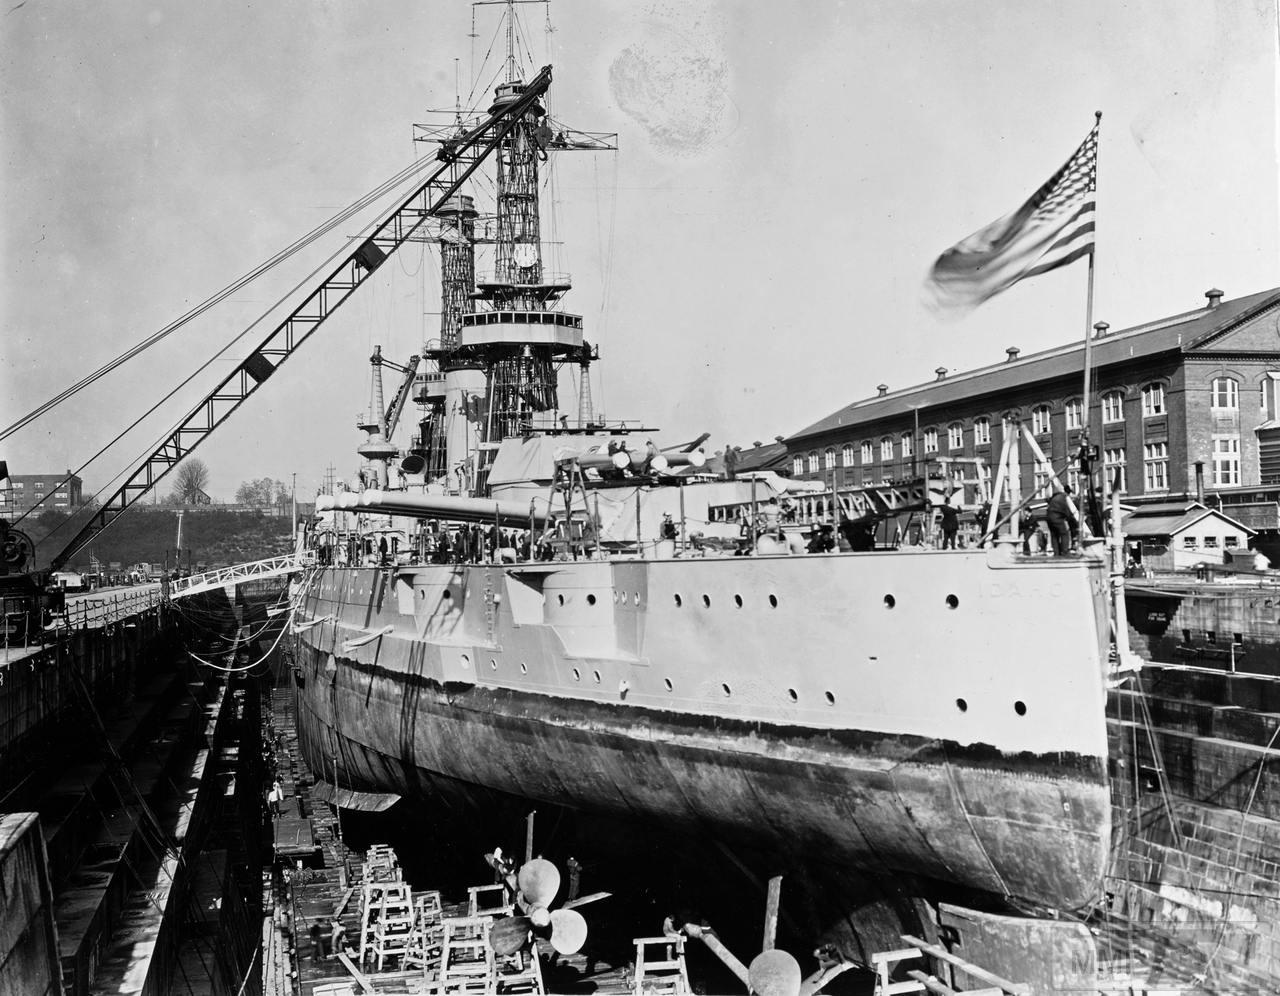 36020 - USS Idaho (BB-42) в доке Puget Sound Naval Shipyard, 8 марта 1926 г.